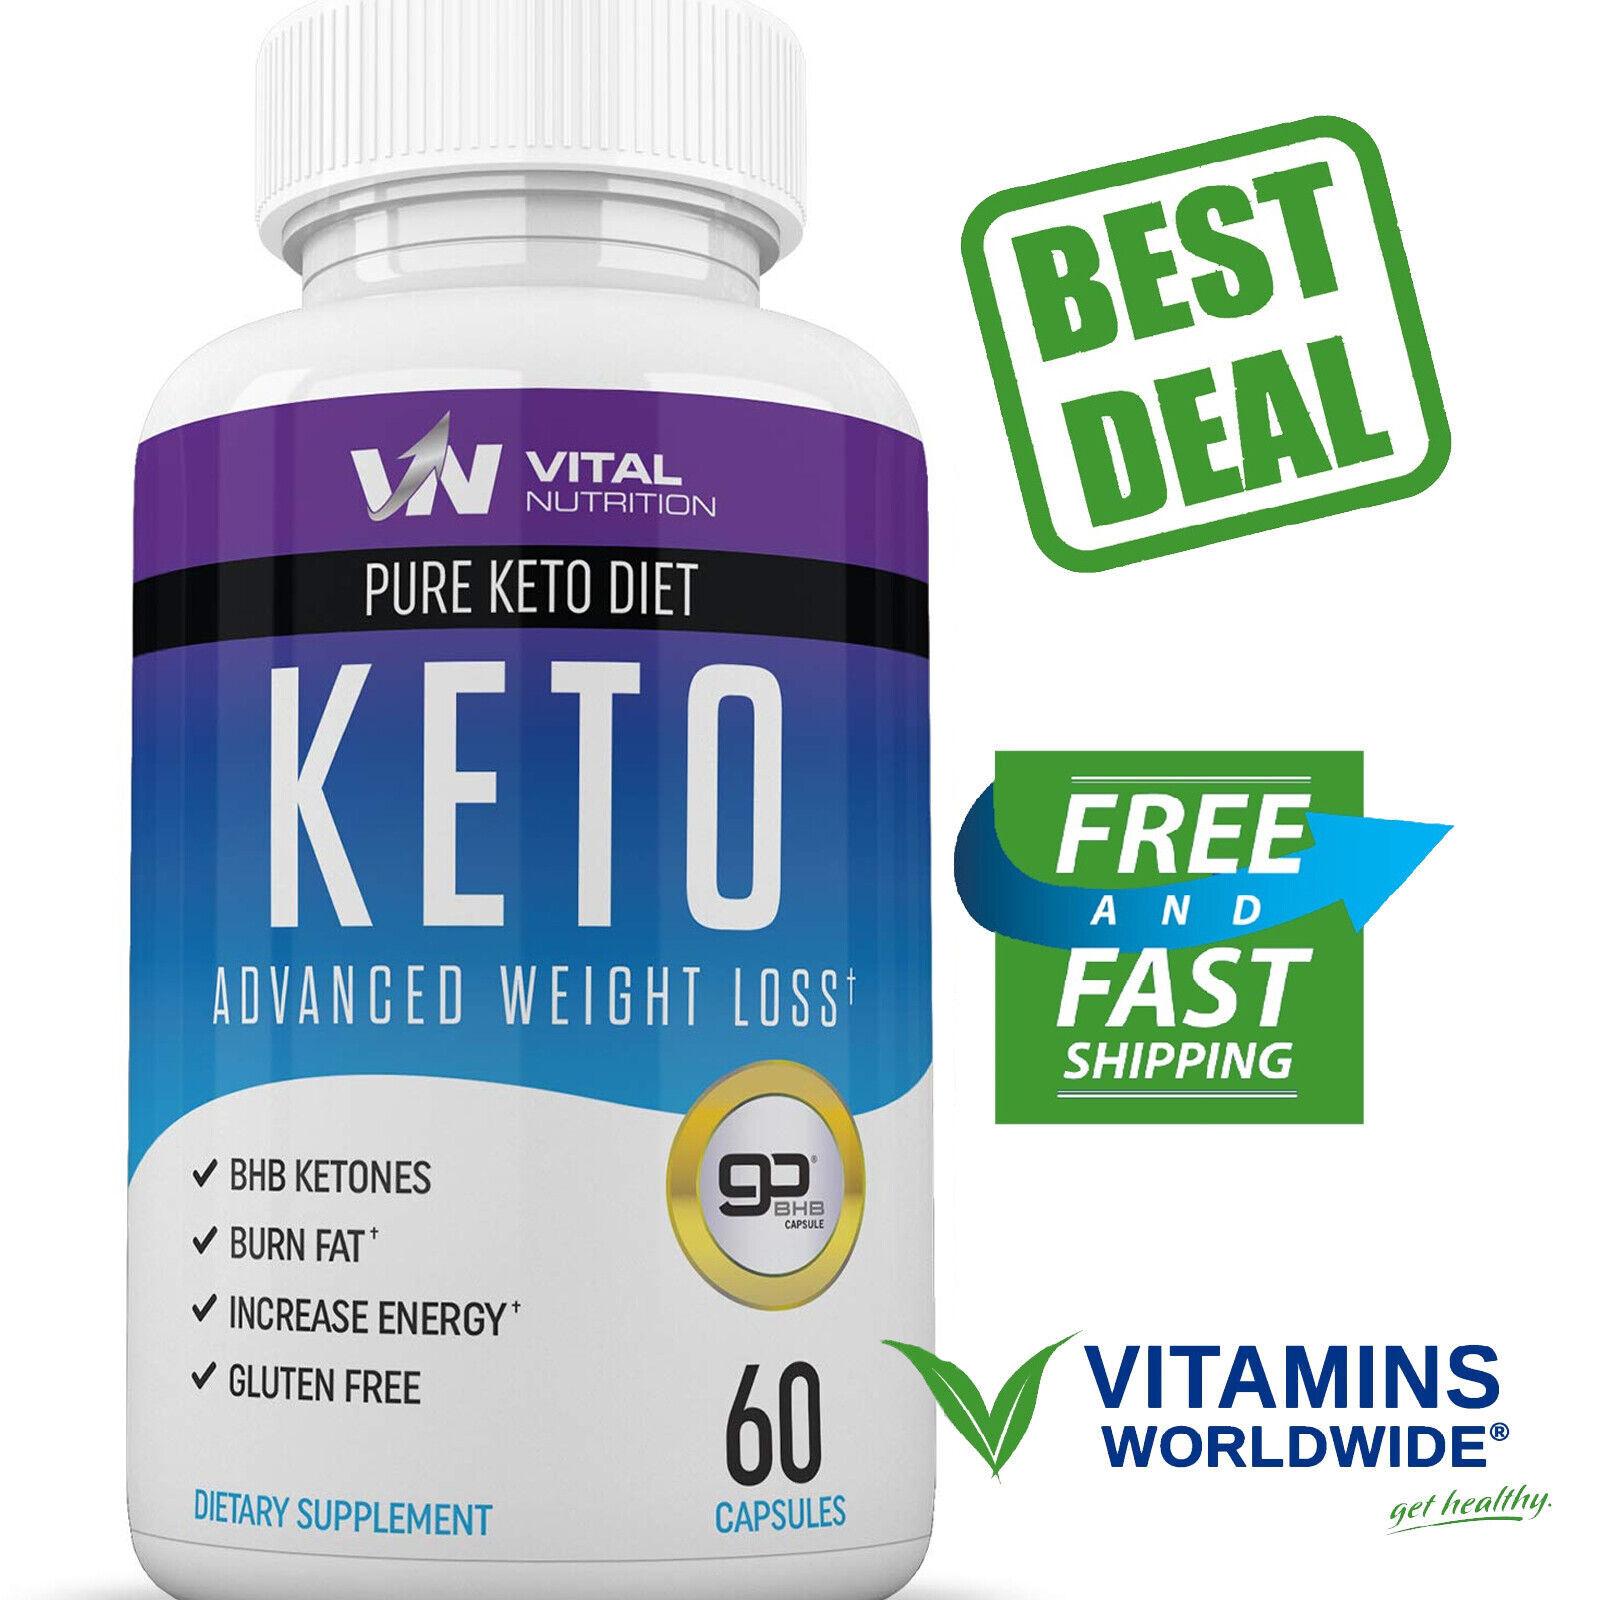 KETO BURN WEIGHT Loss Supplement Fat Burner Boost Energy Metabolism 60 Capsules 1